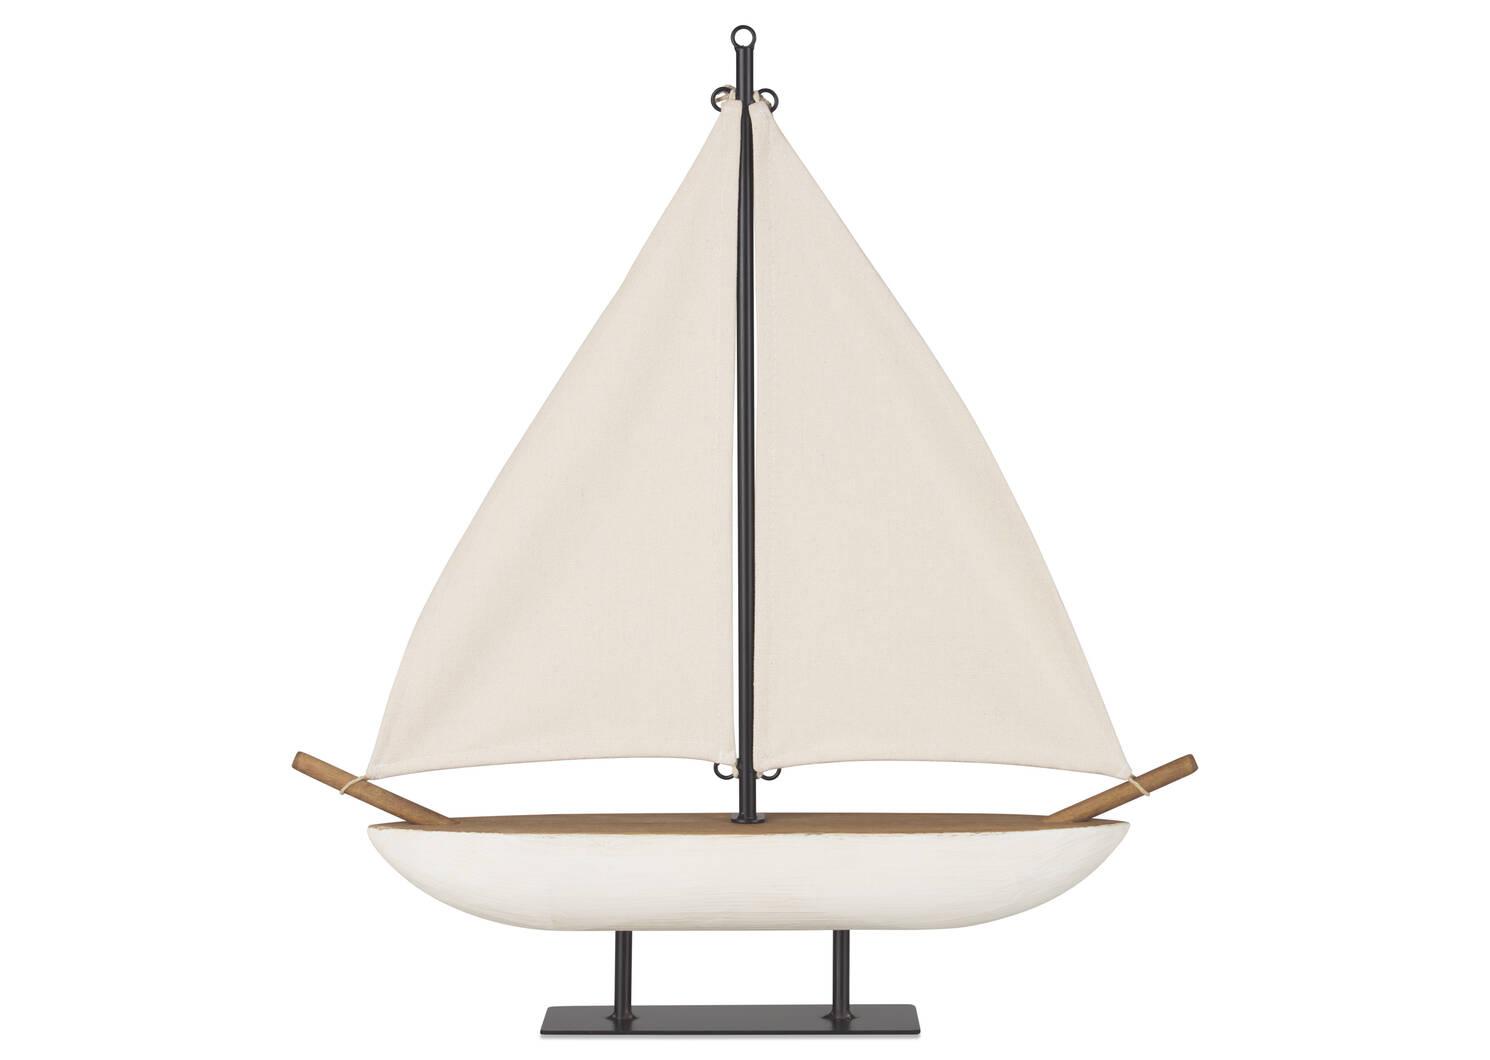 Thurston Sailboat Decor